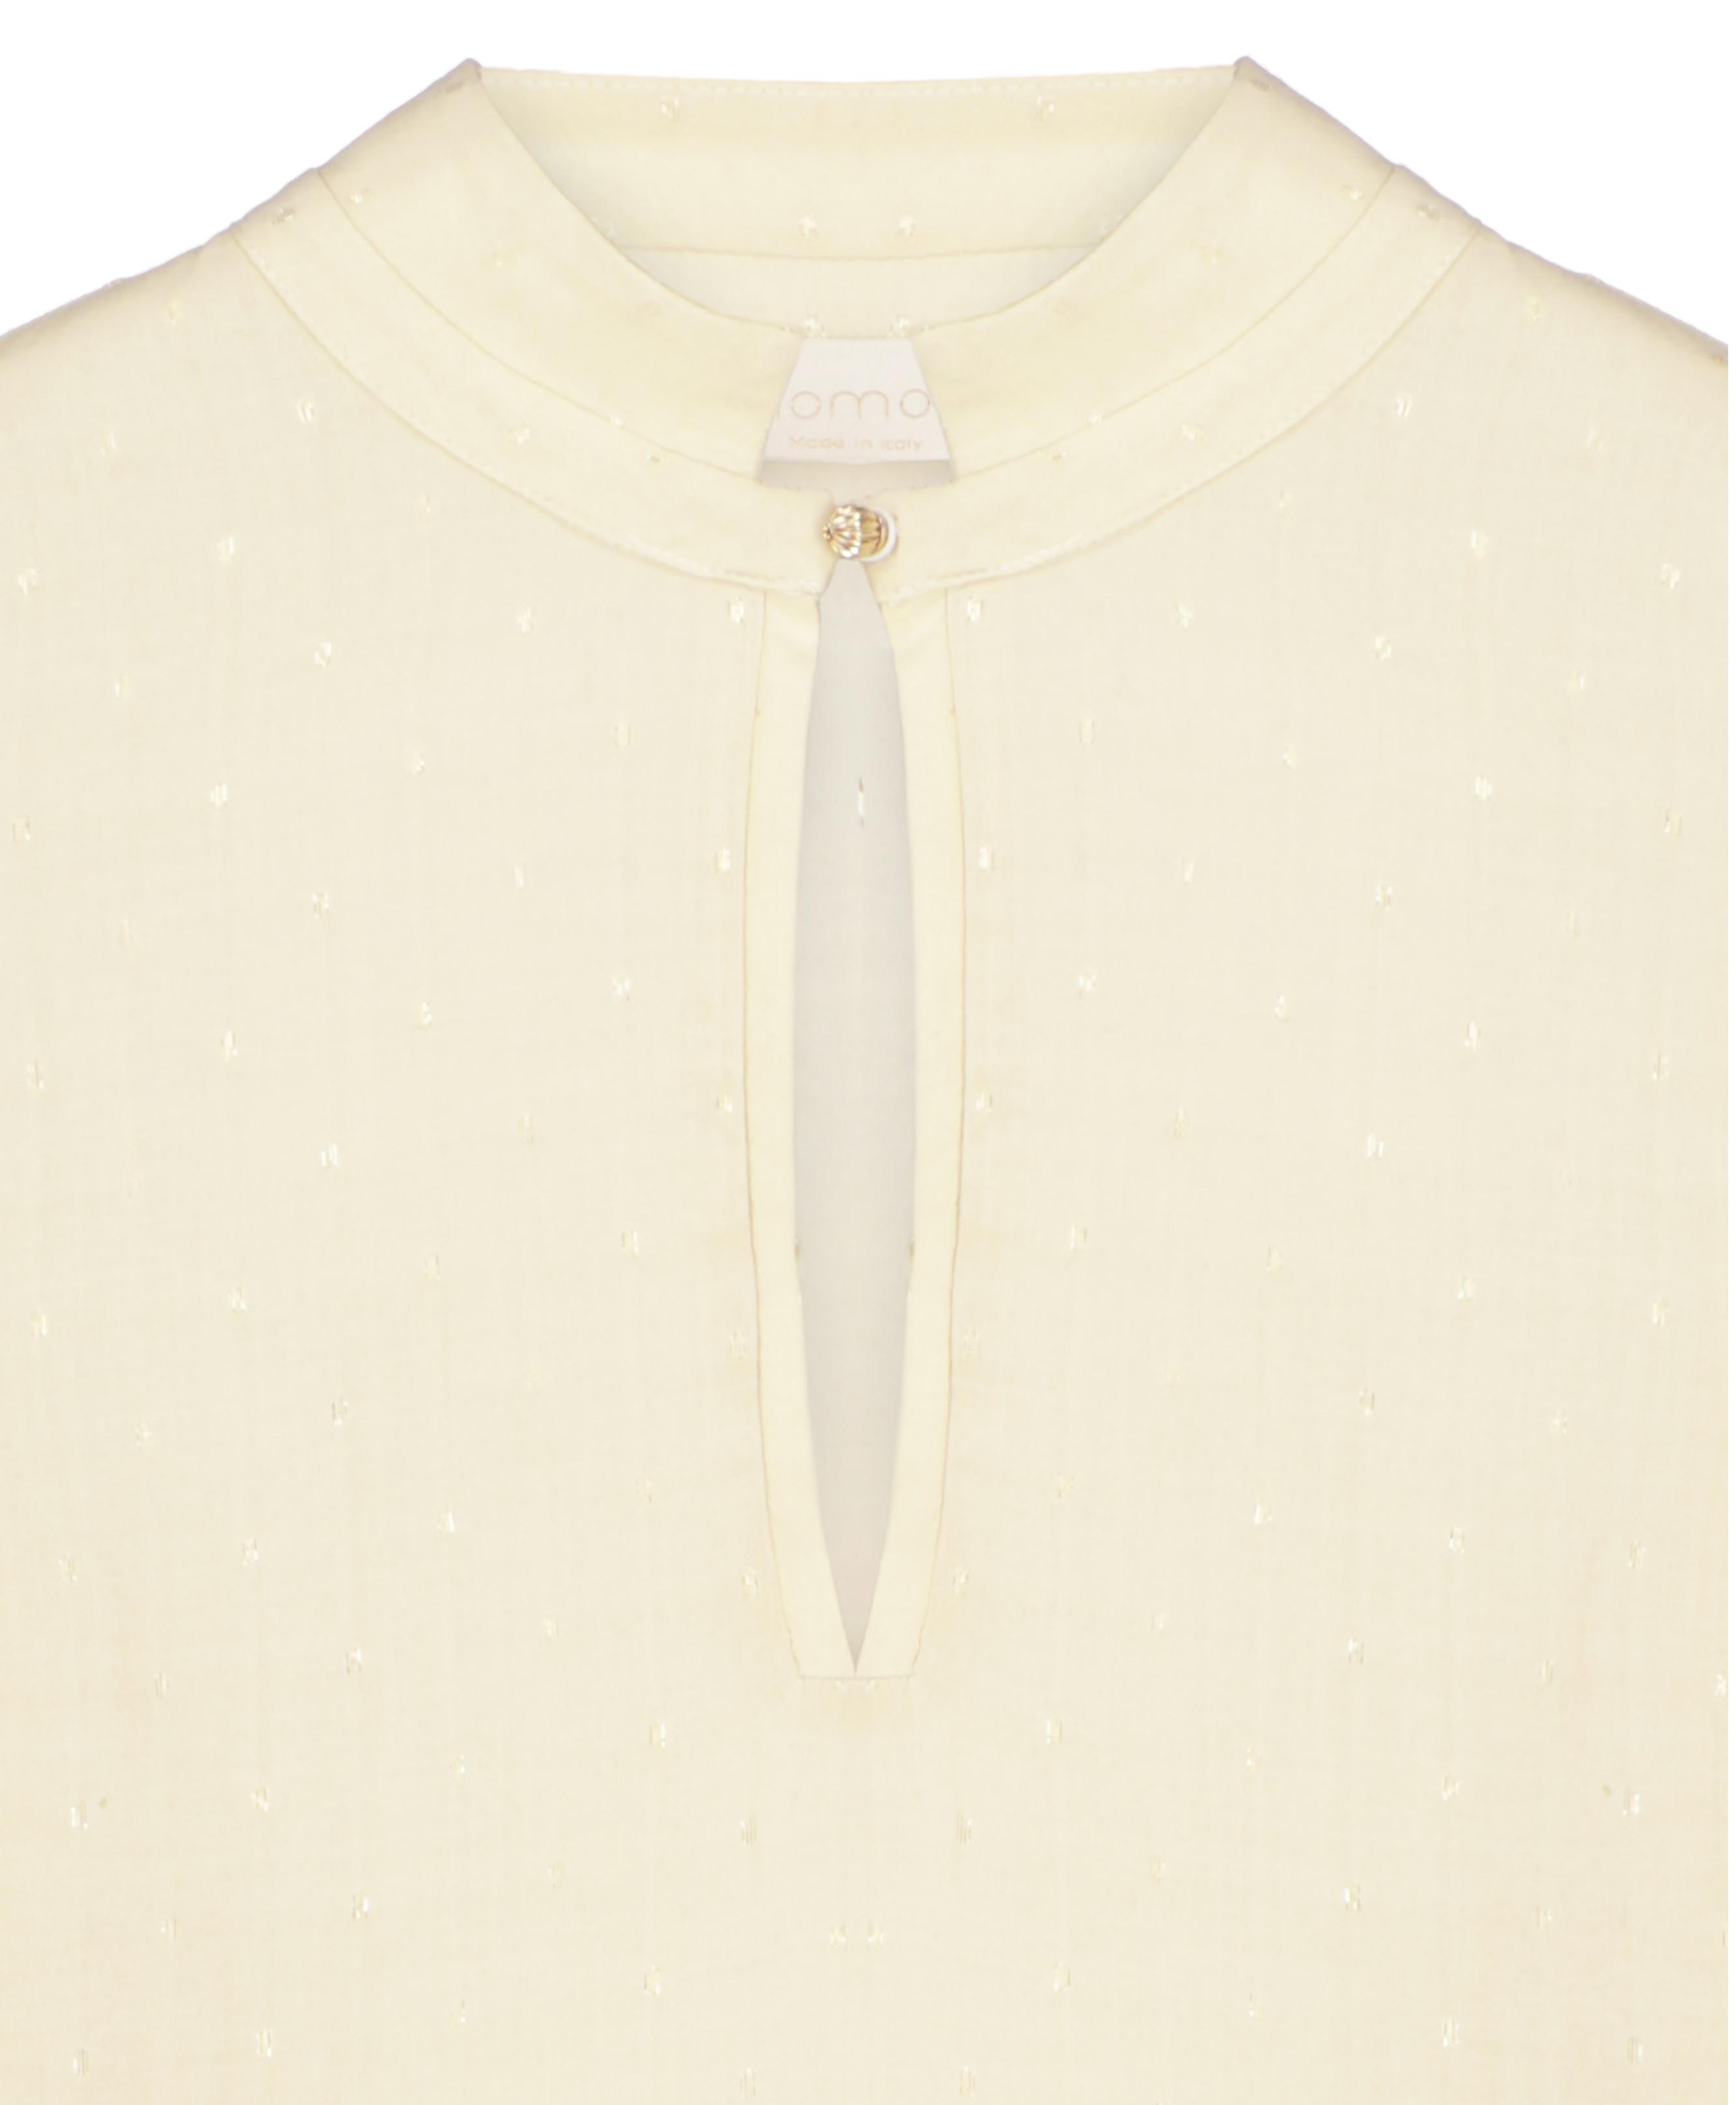 Centauro blouse with golden polka dots MOMONI | Blouse | MOBL0070026